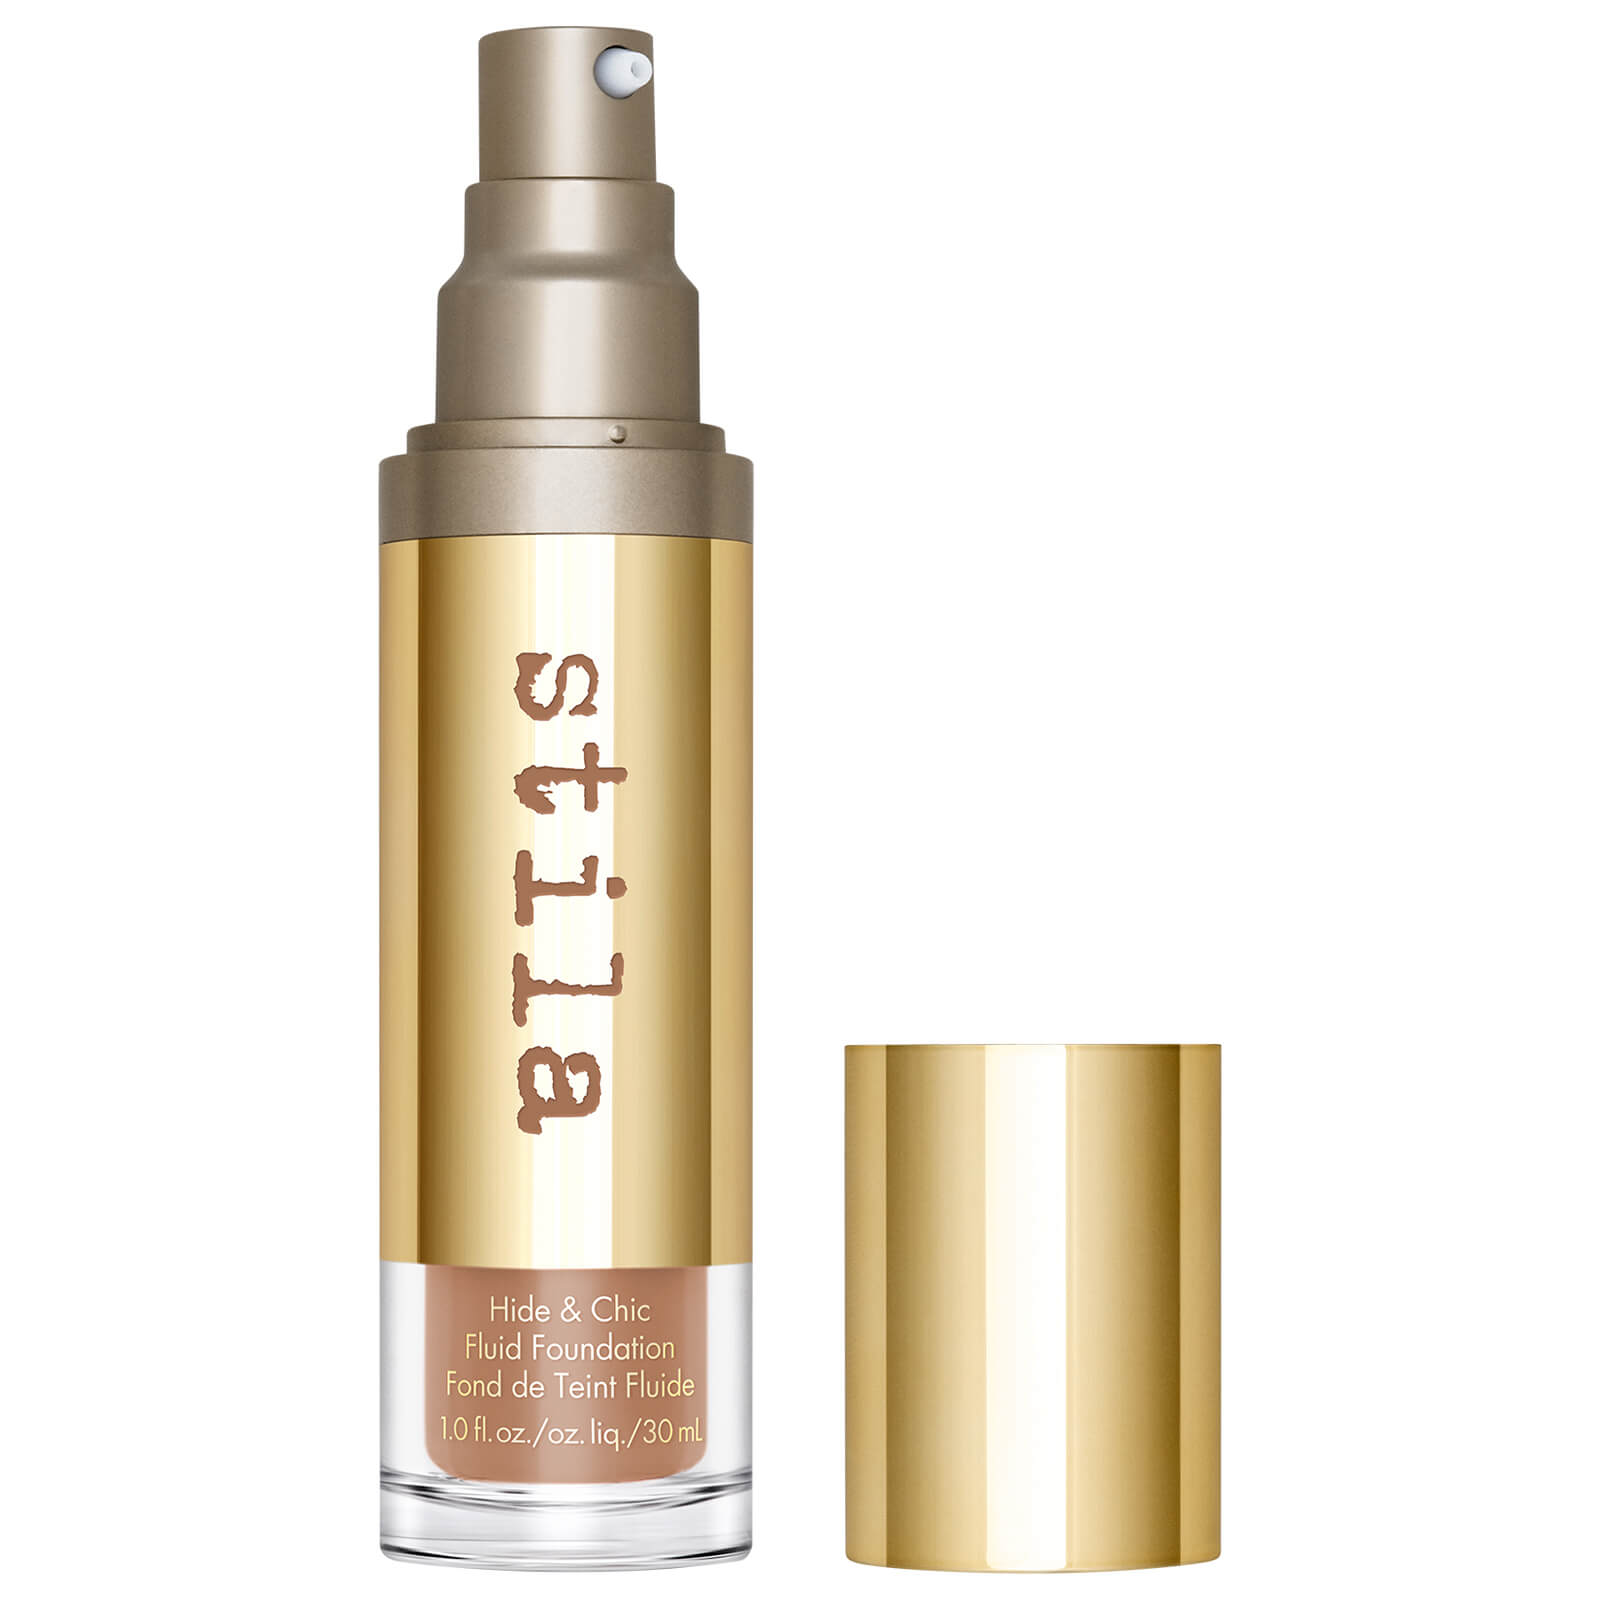 Купить Stila Hide and Chic Fluid Foundation 30ml (Various Shades) - Tan 3